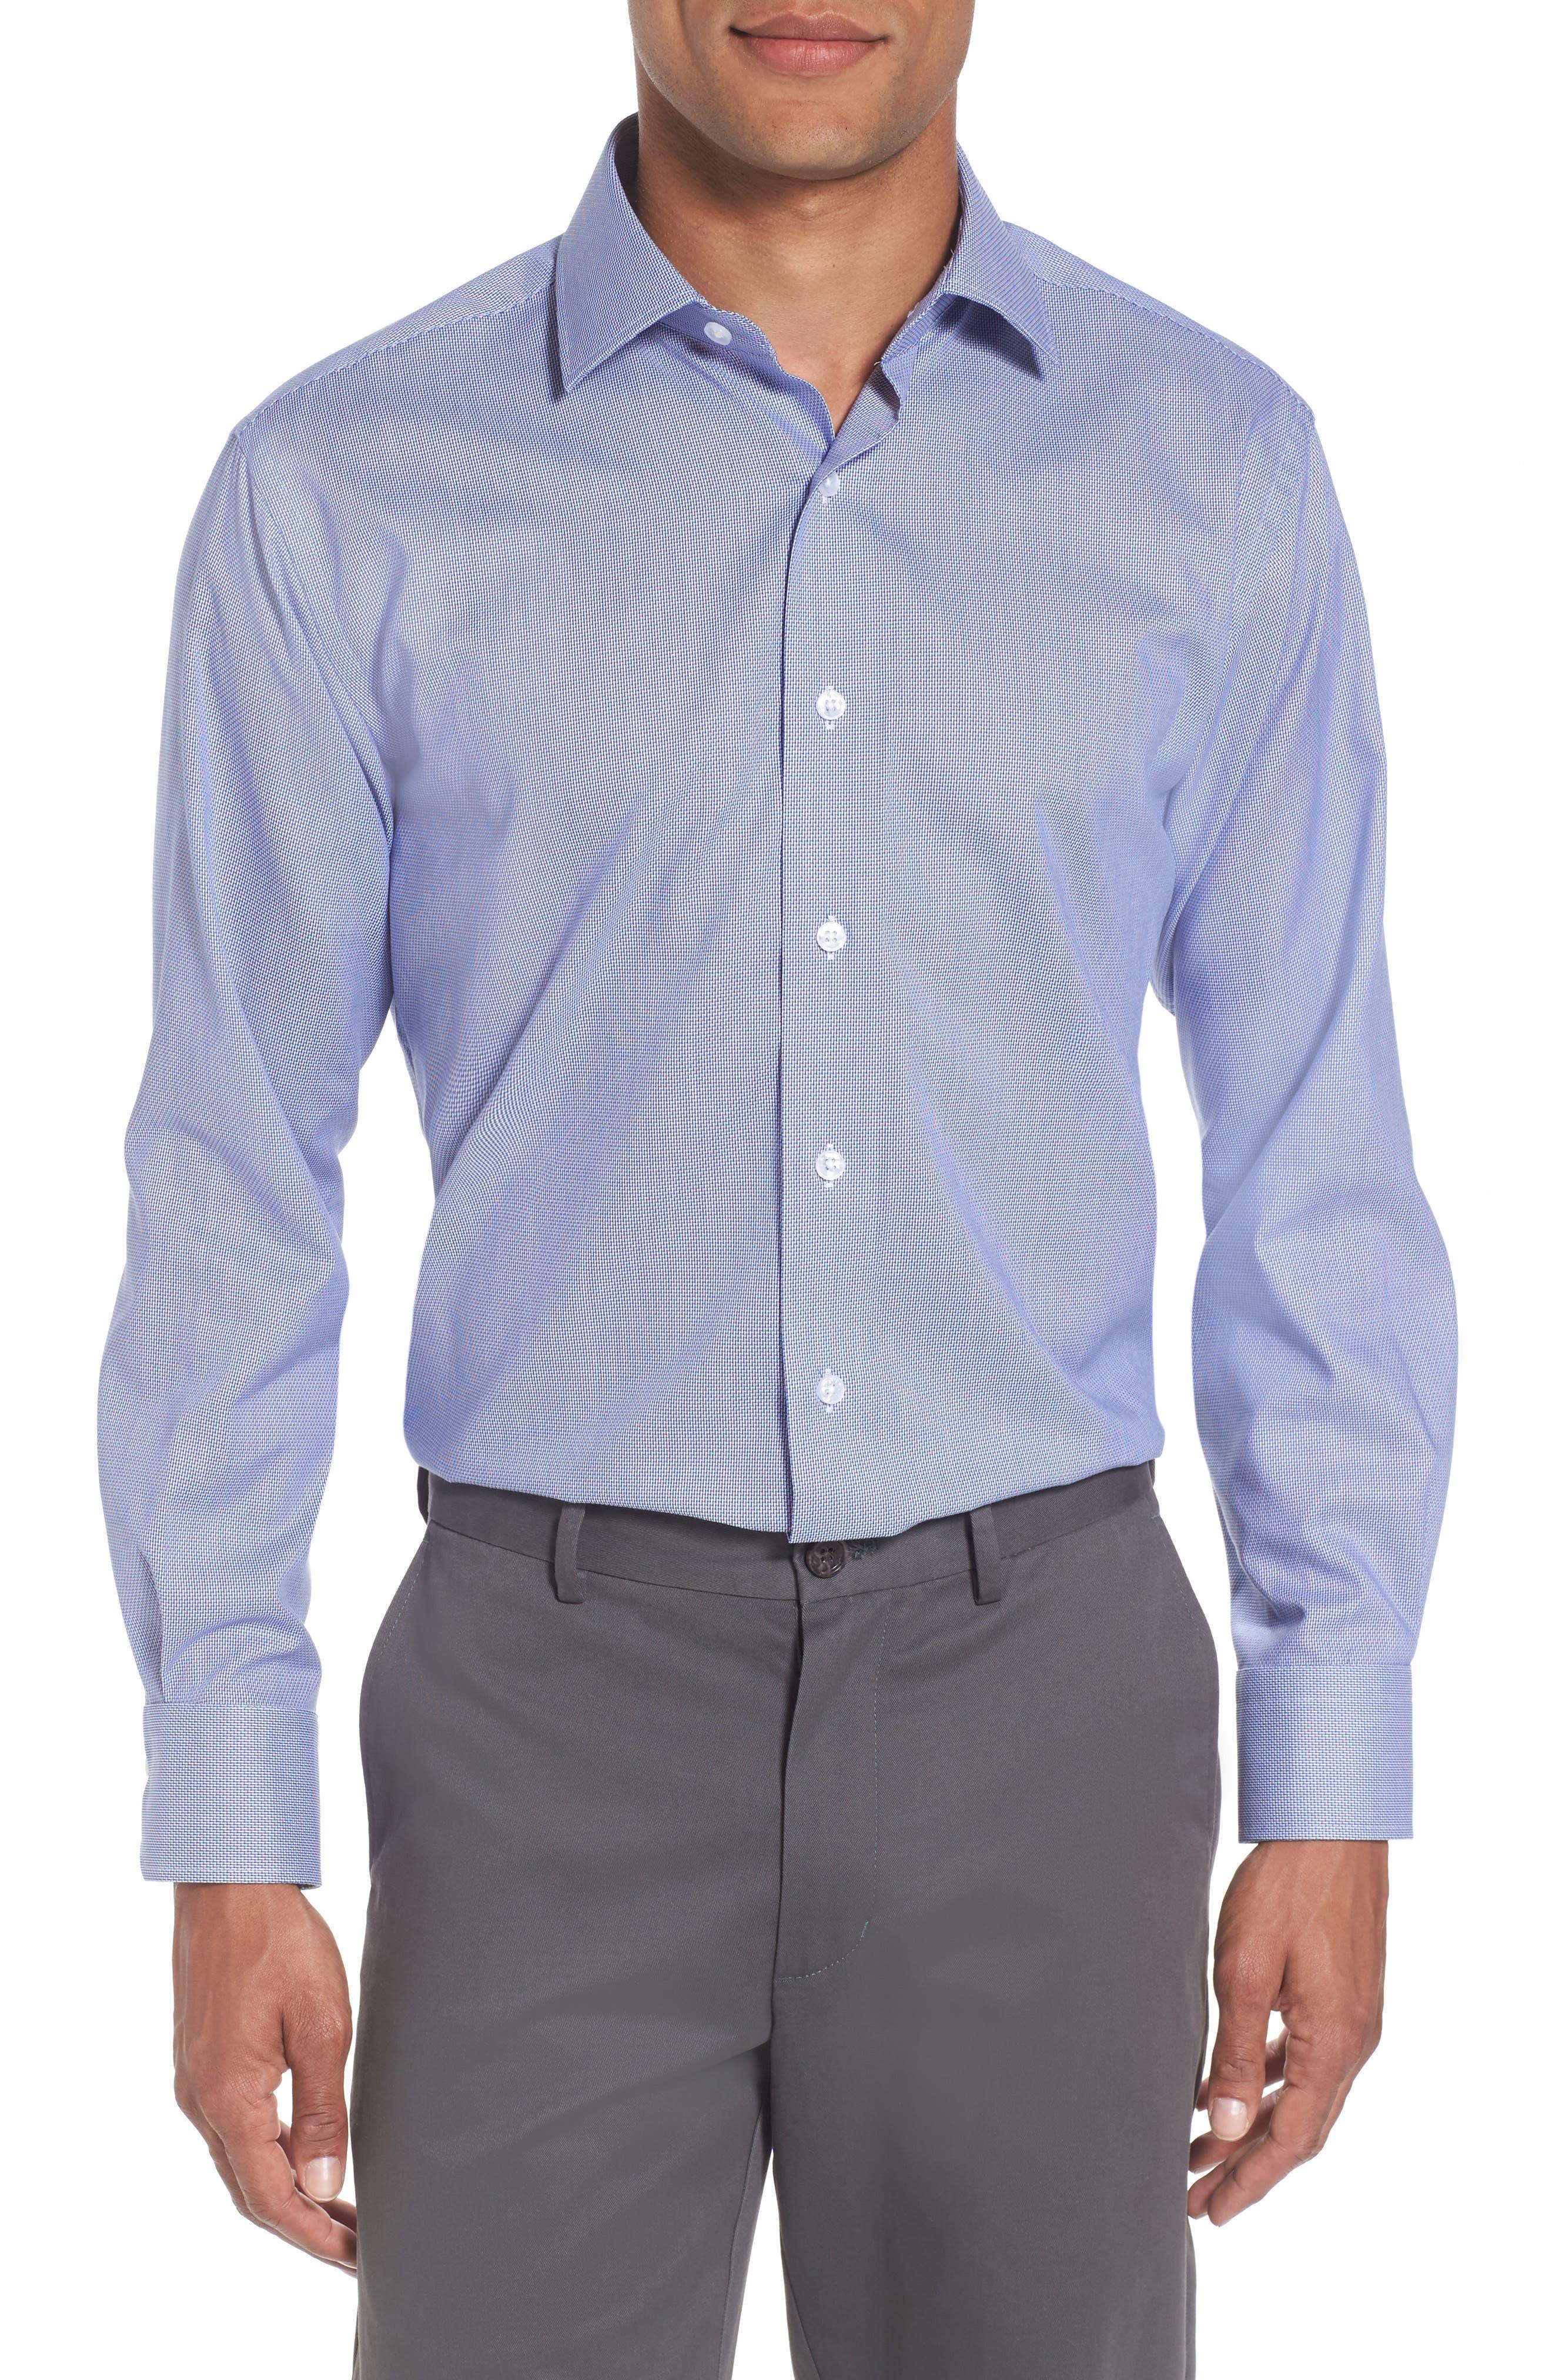 Trim Fit Solid Dress Shirt,                             Main thumbnail 1, color,                             Navy